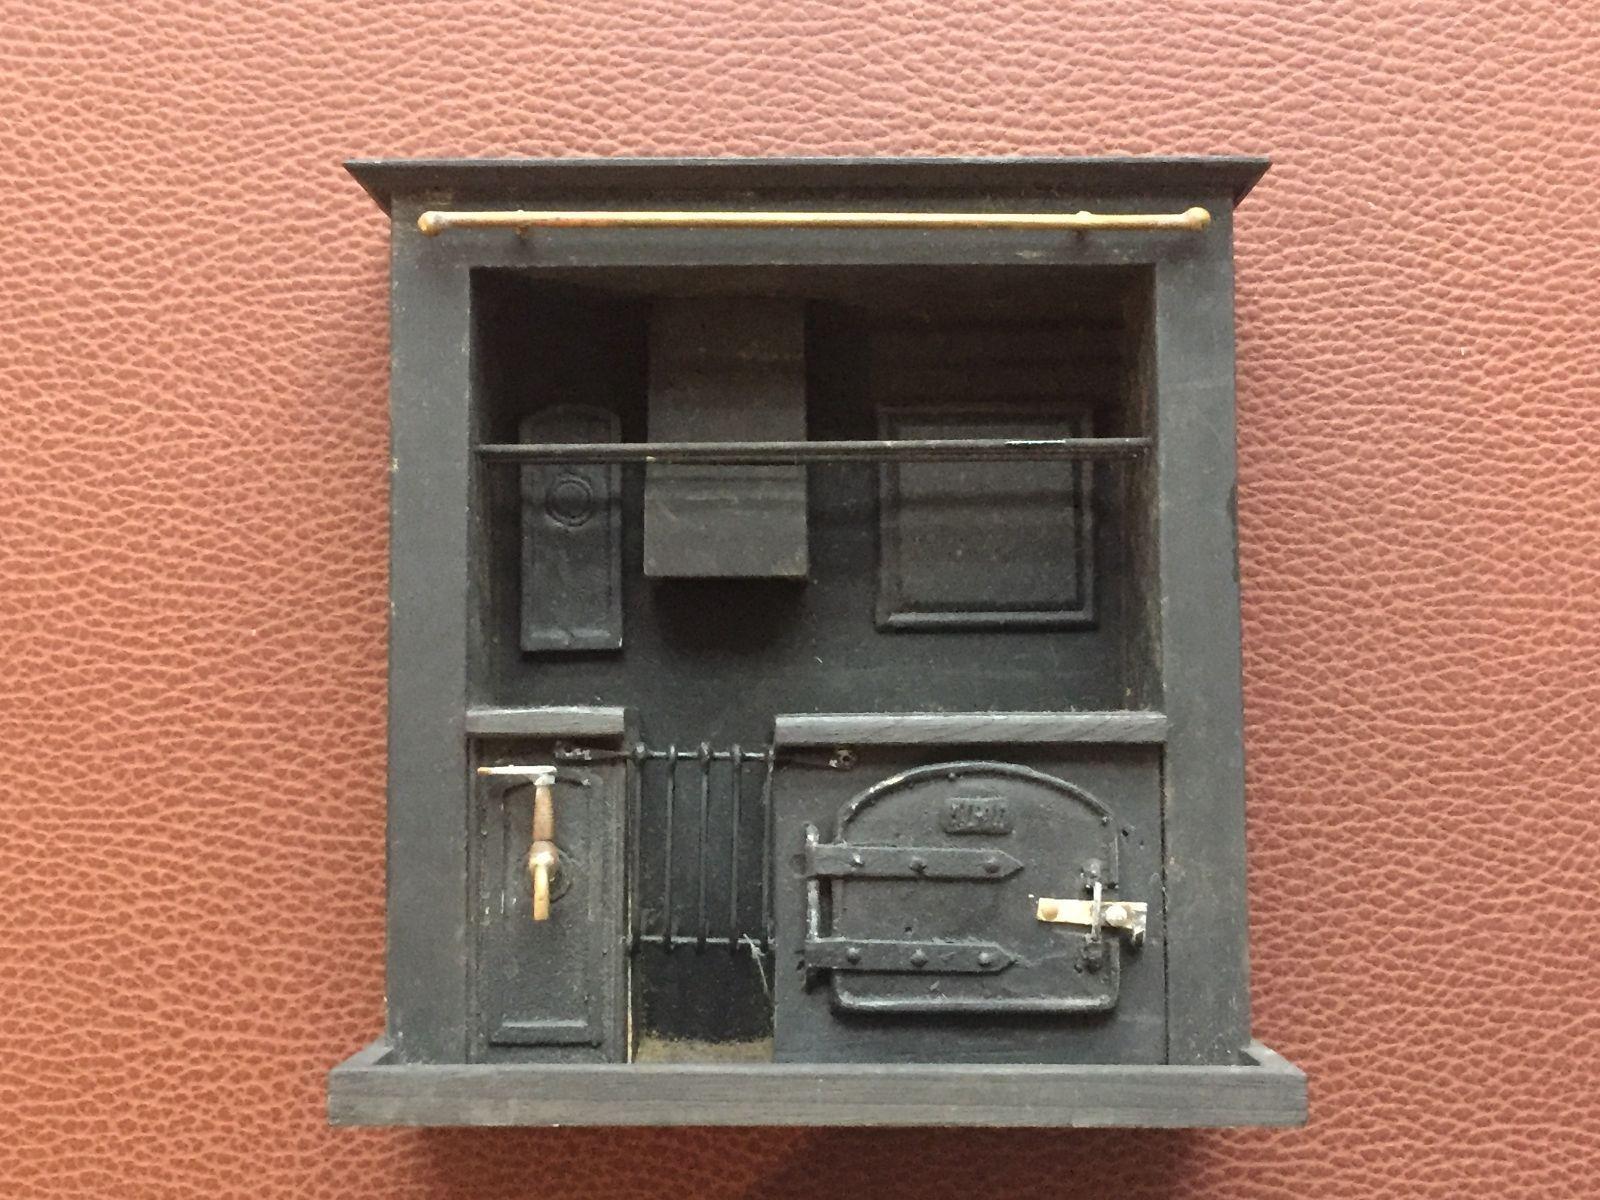 Uk ebay fireplaces and ranges pinterest kitchen